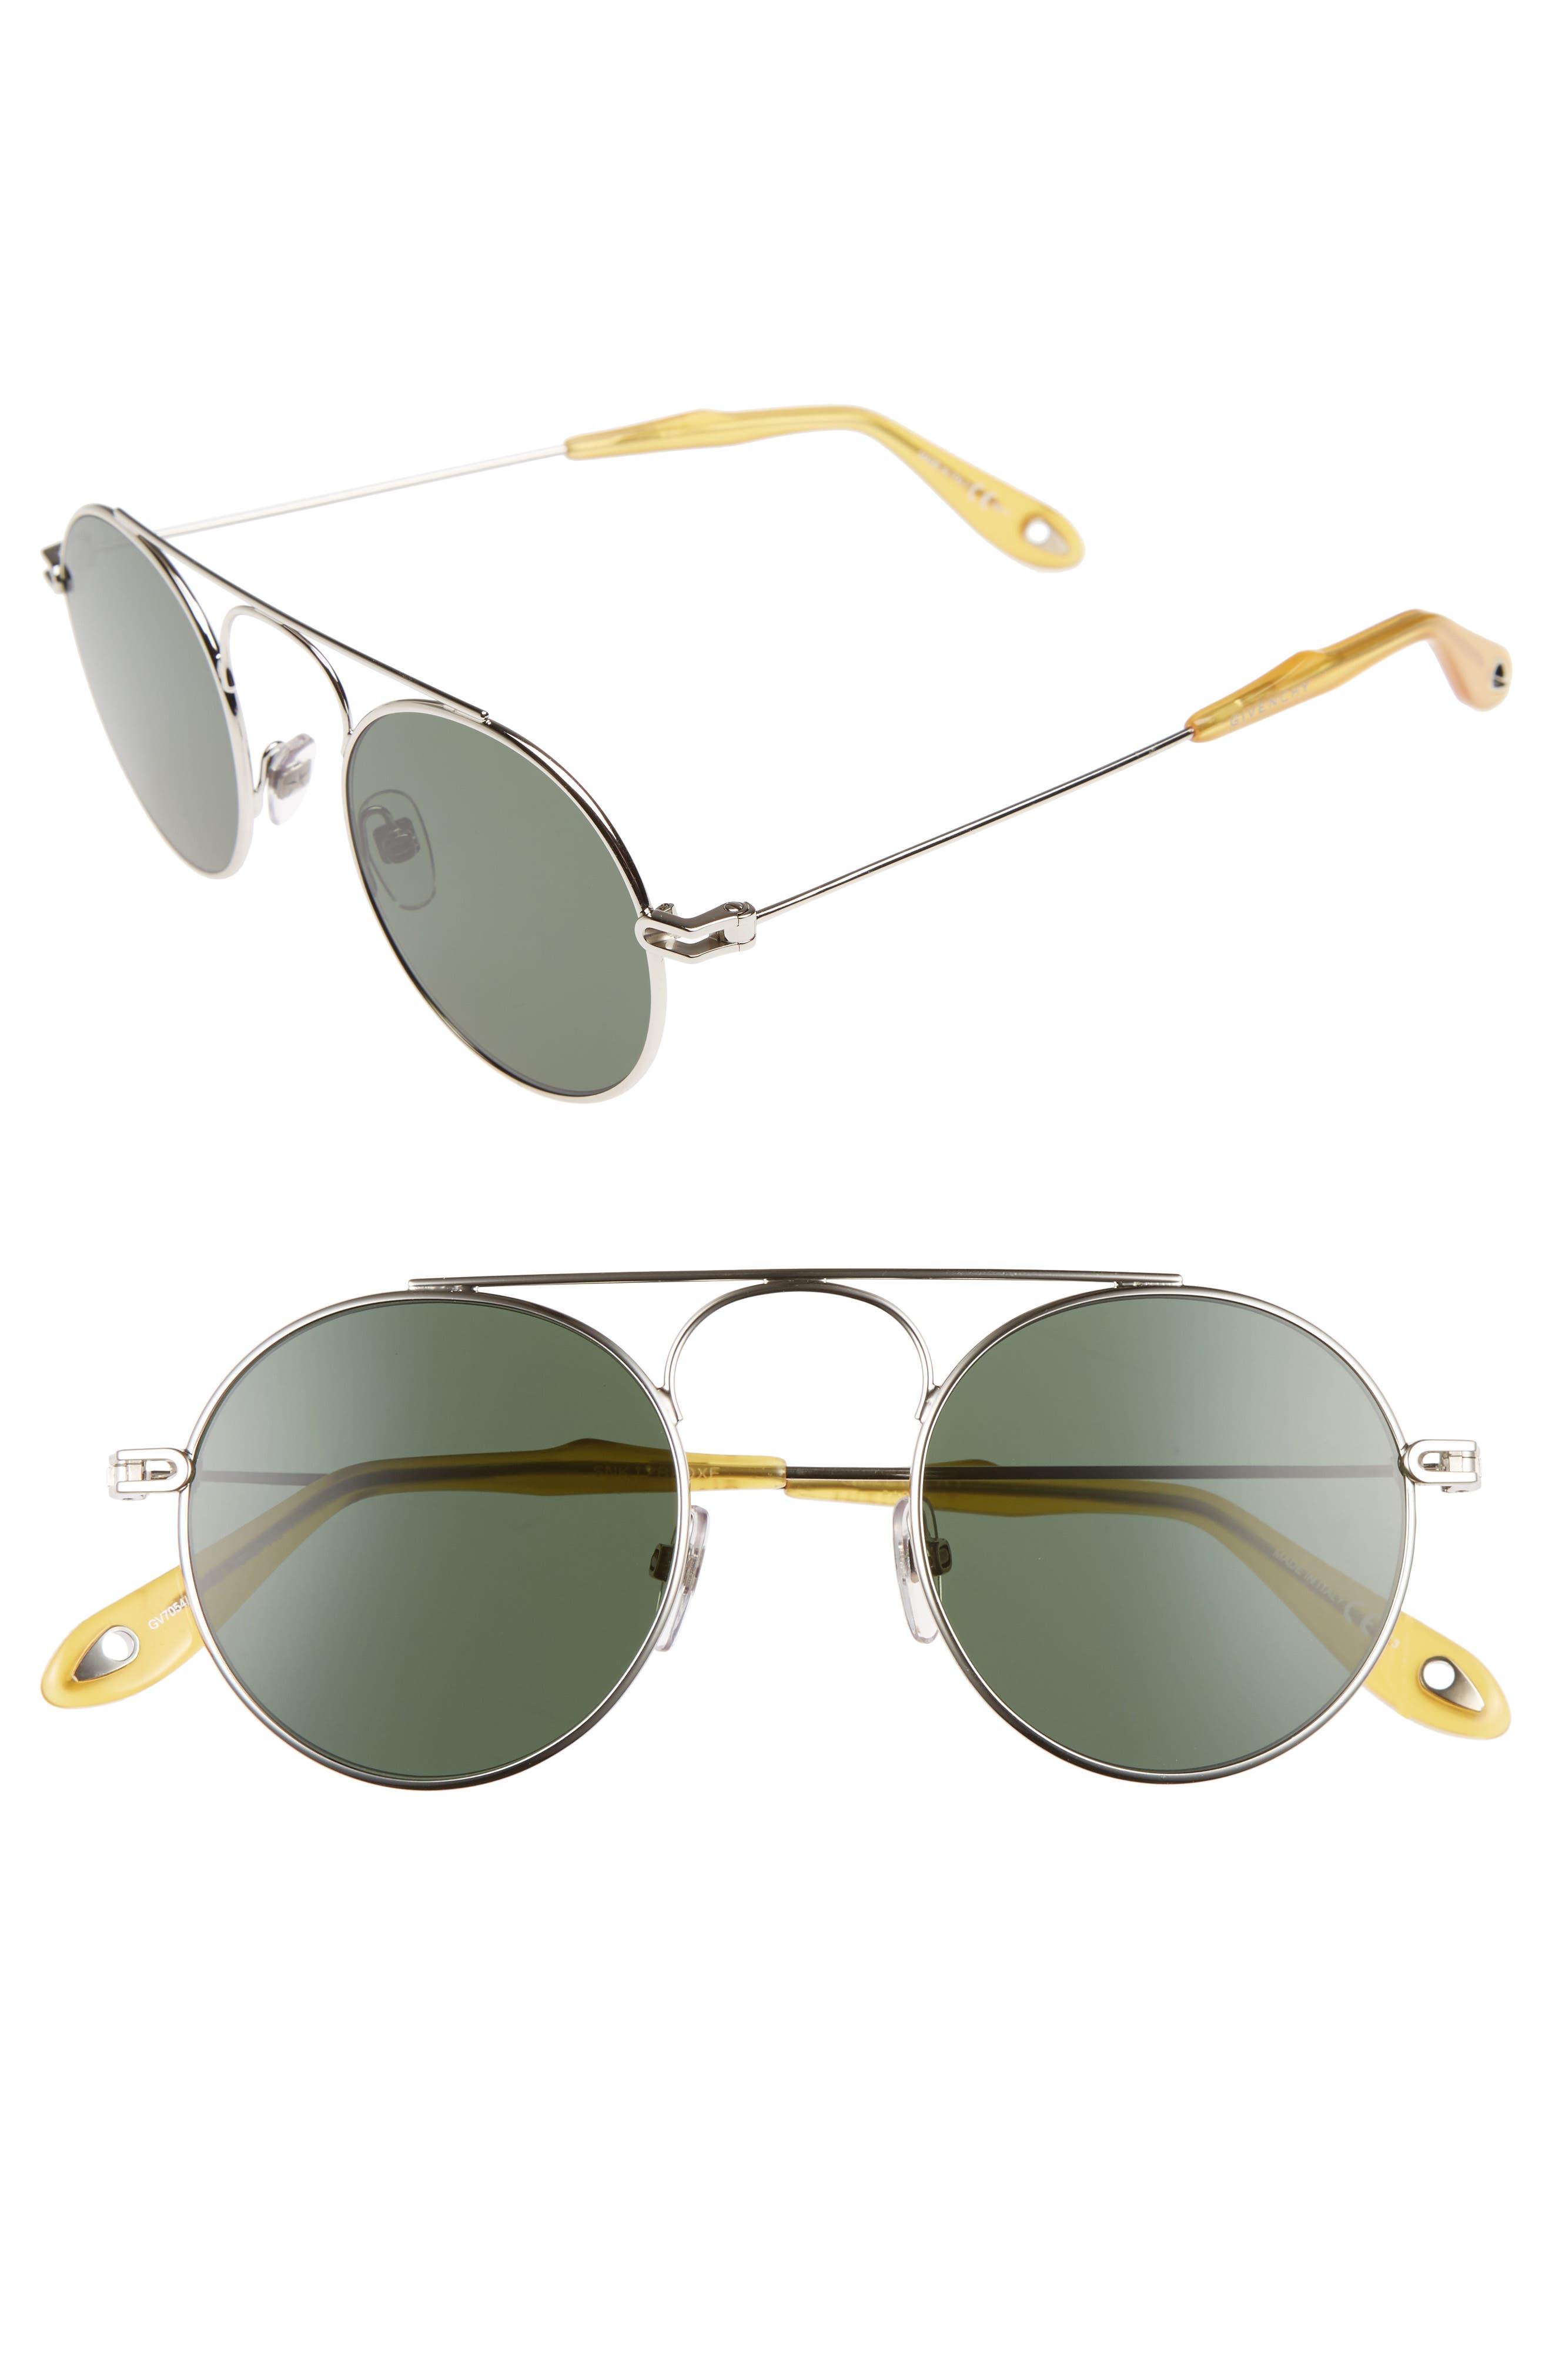 48mm Round Sunglasses,                             Main thumbnail 1, color,                             043